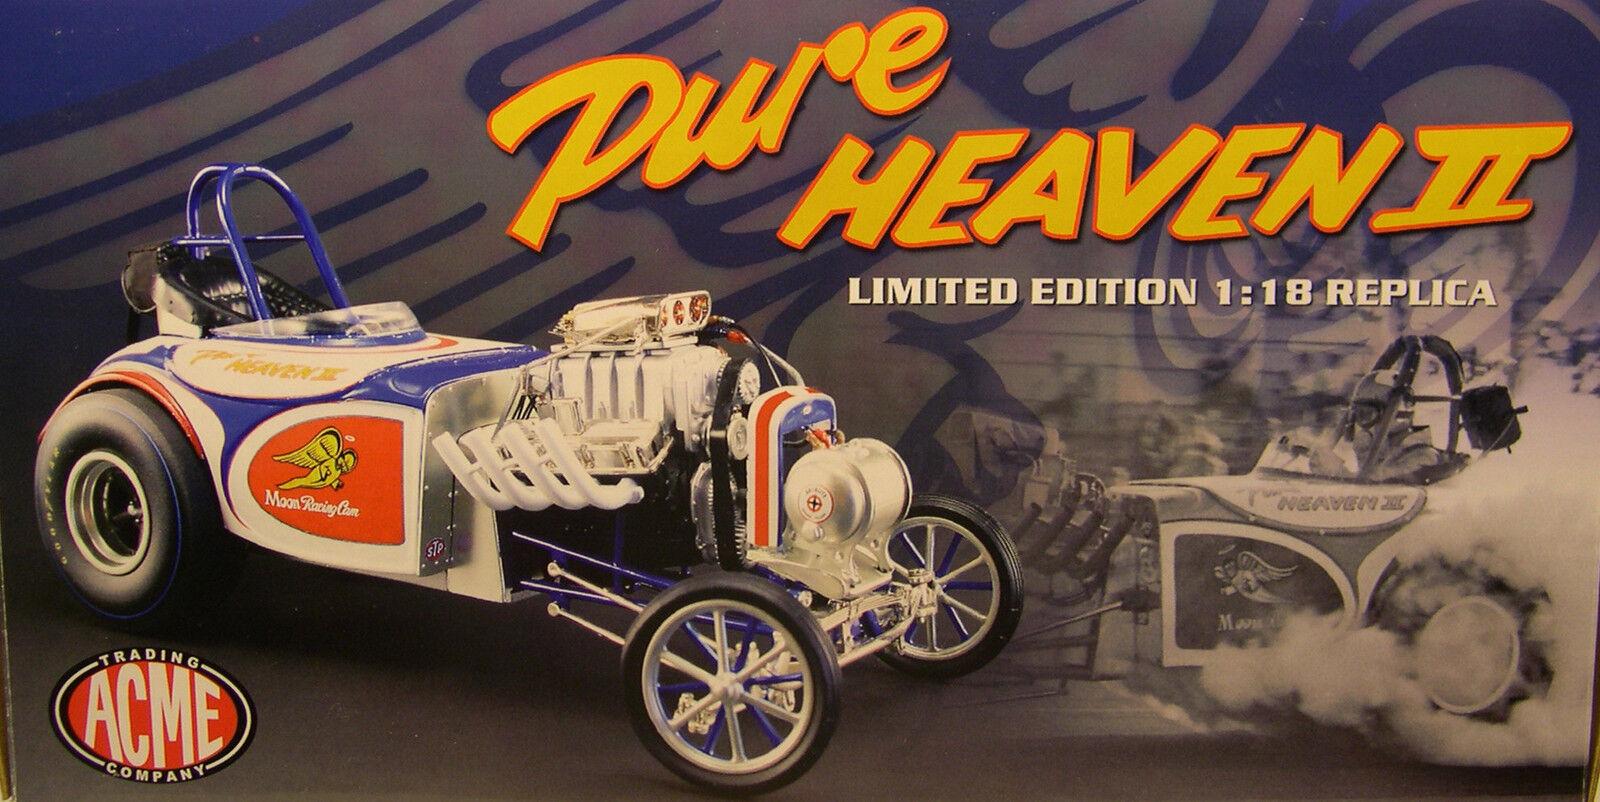 PURE HEAVEN II ALTErosso DRAG CAR ACME 1:18 SCALE DIECAST METAL MODEL CAR